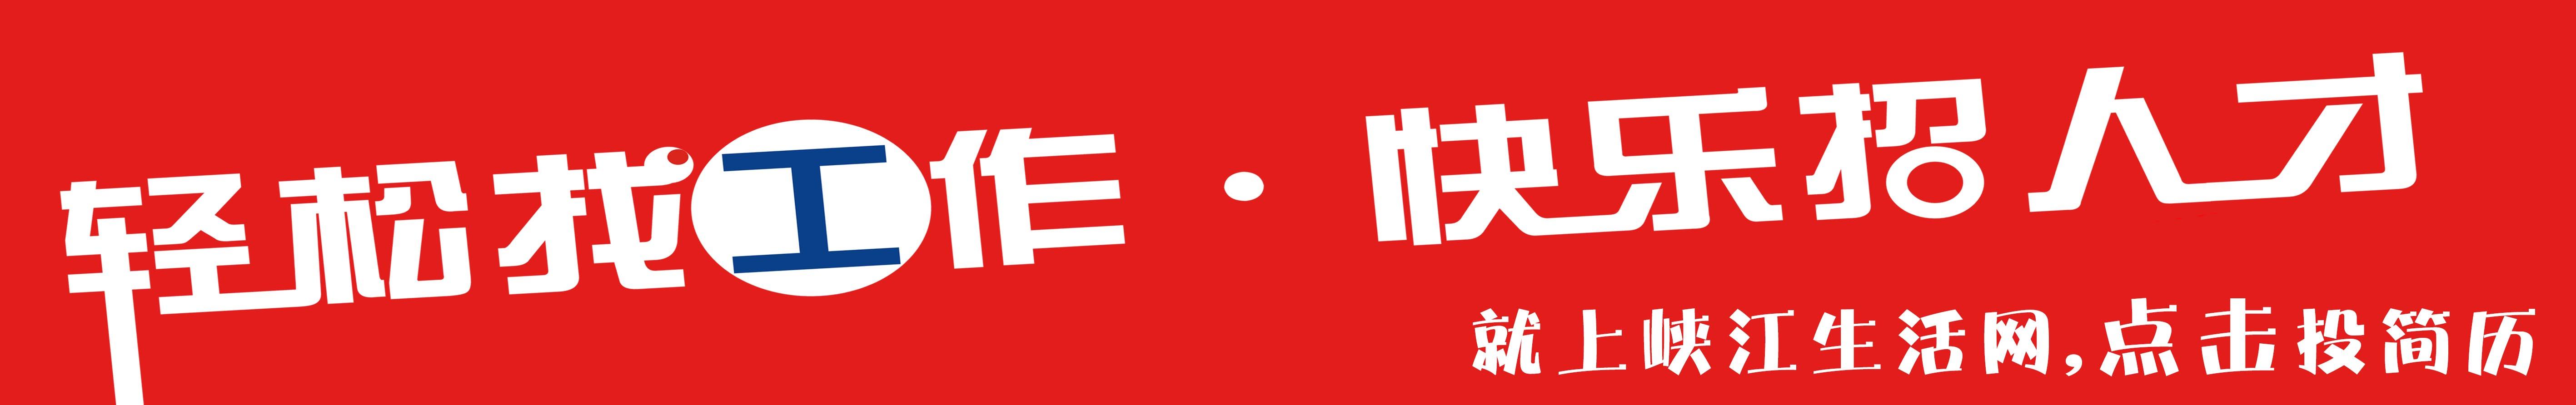 http://p9.pccoo.cn/vote/20180510/2018051016023953868414_5669_892.jpg